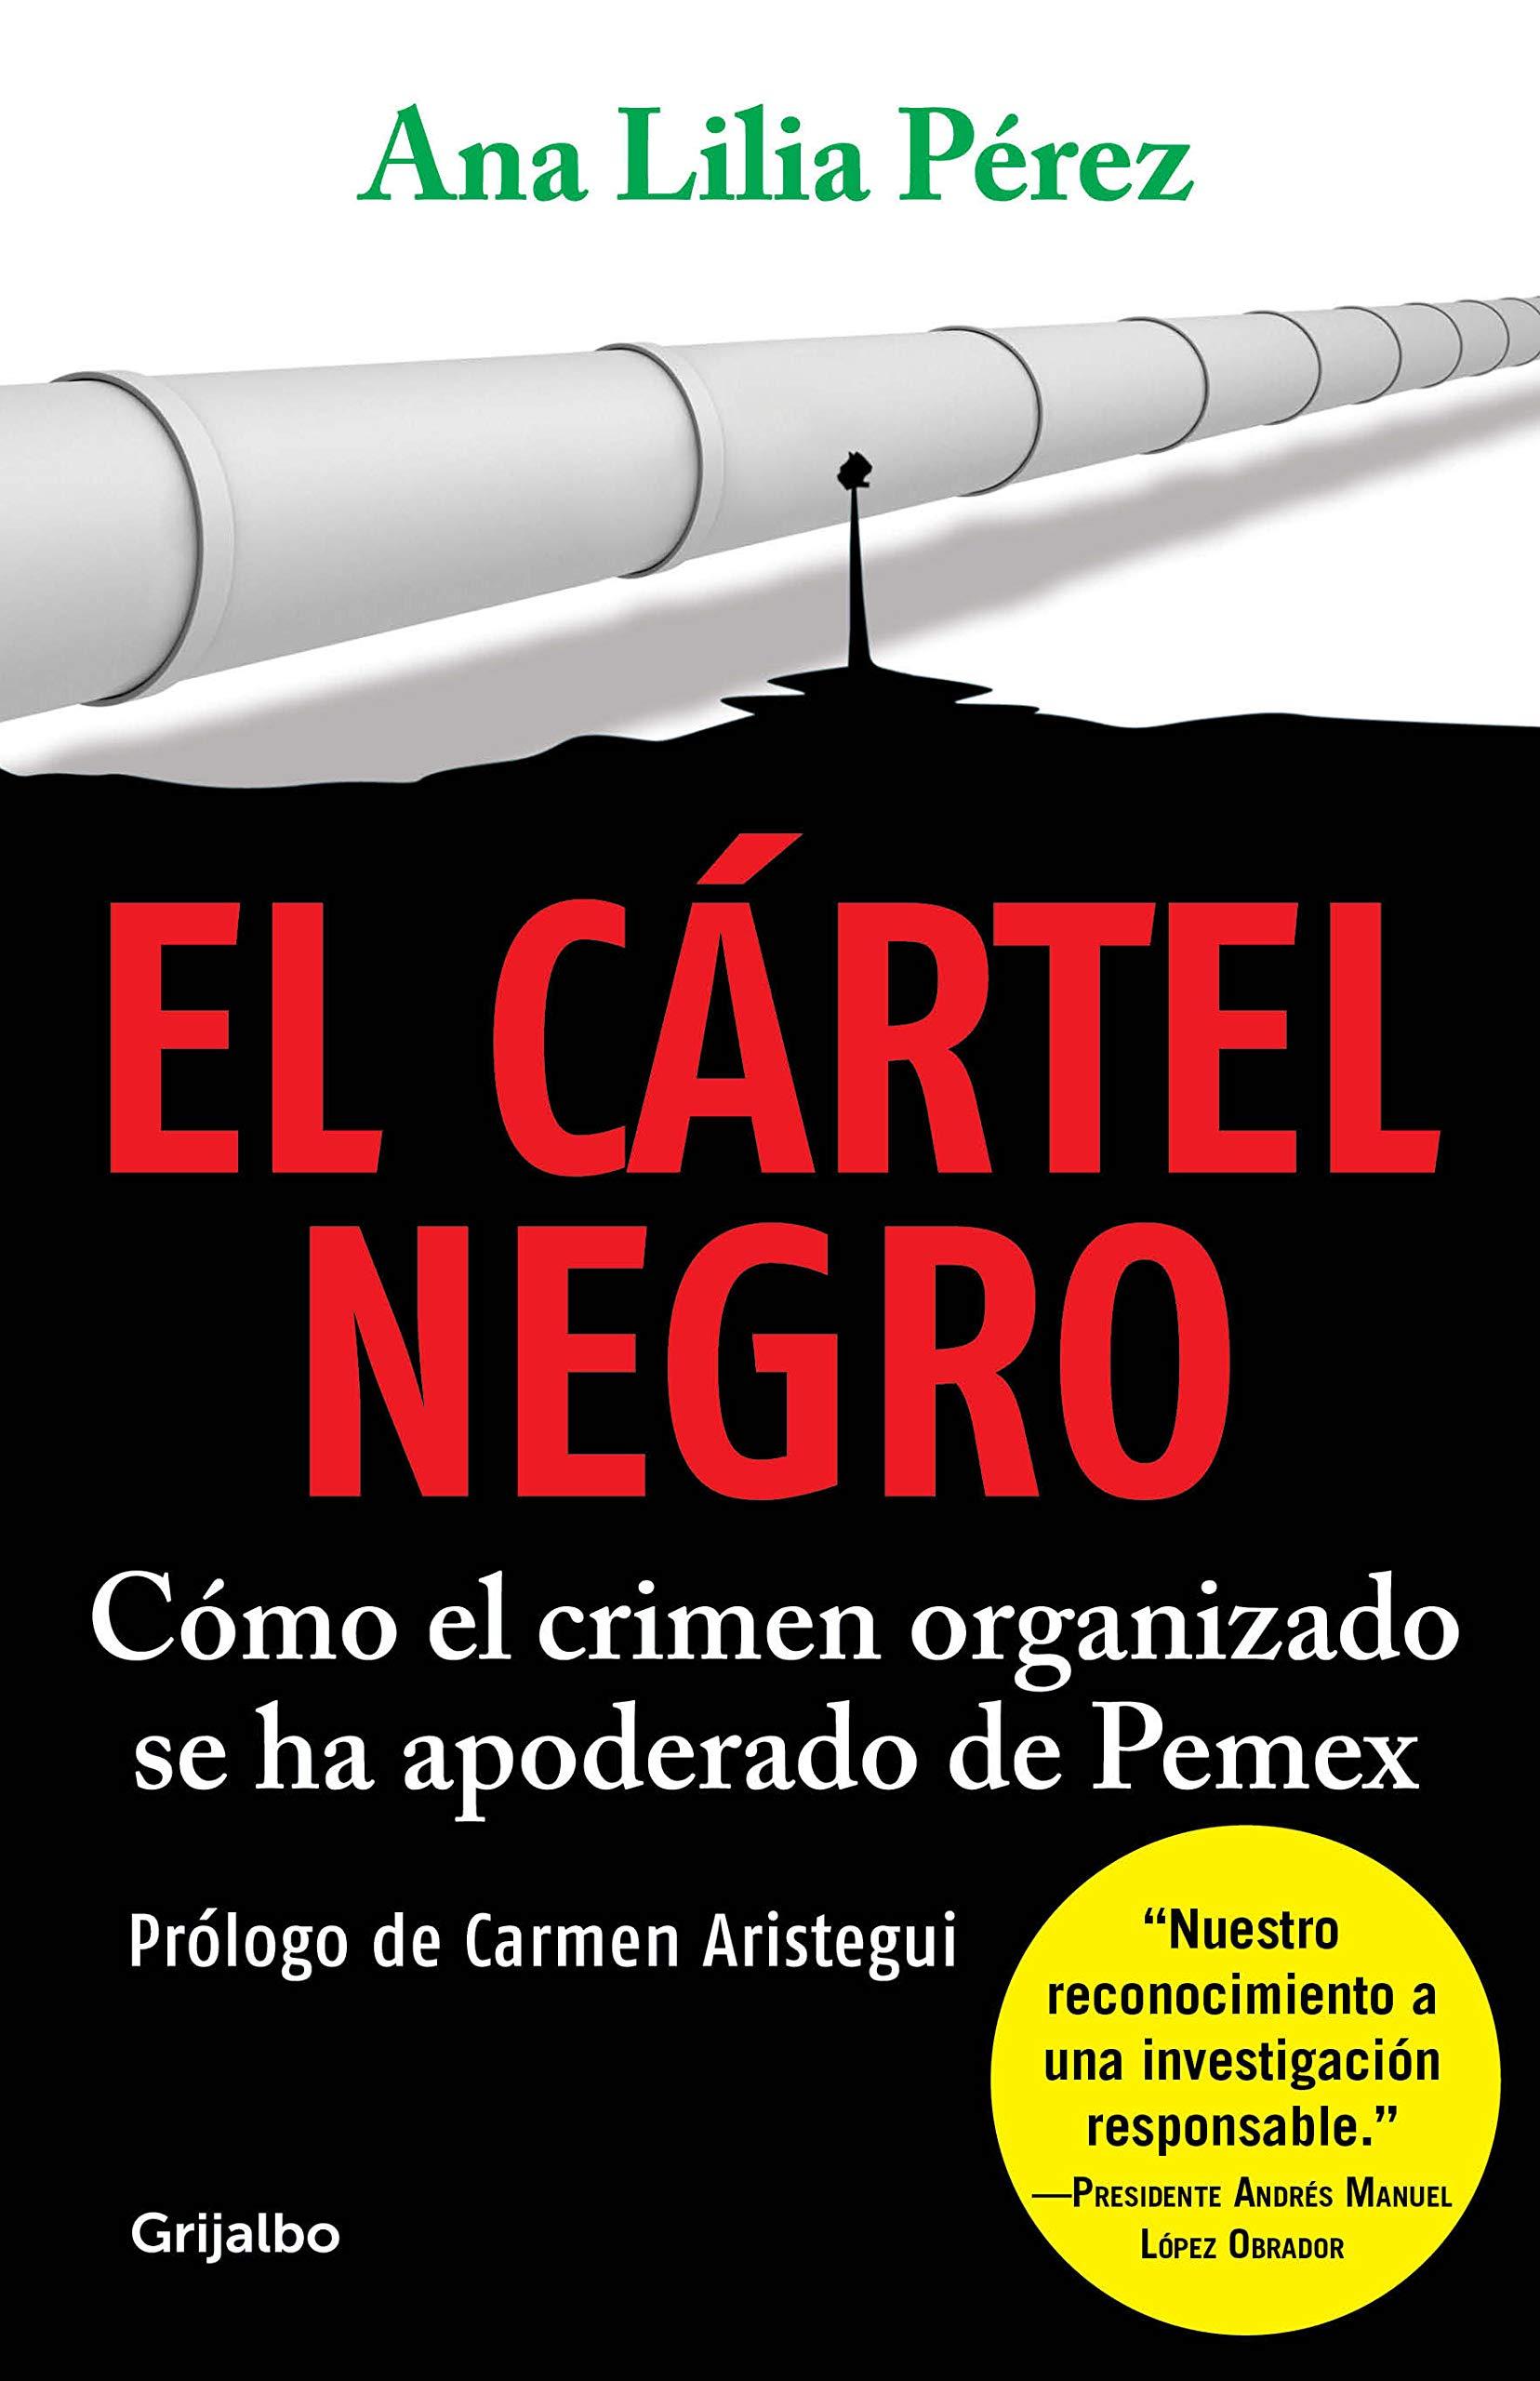 Cártel negro, El: Ana Lilia Pérez: 9786073179300: Amazon.com ...